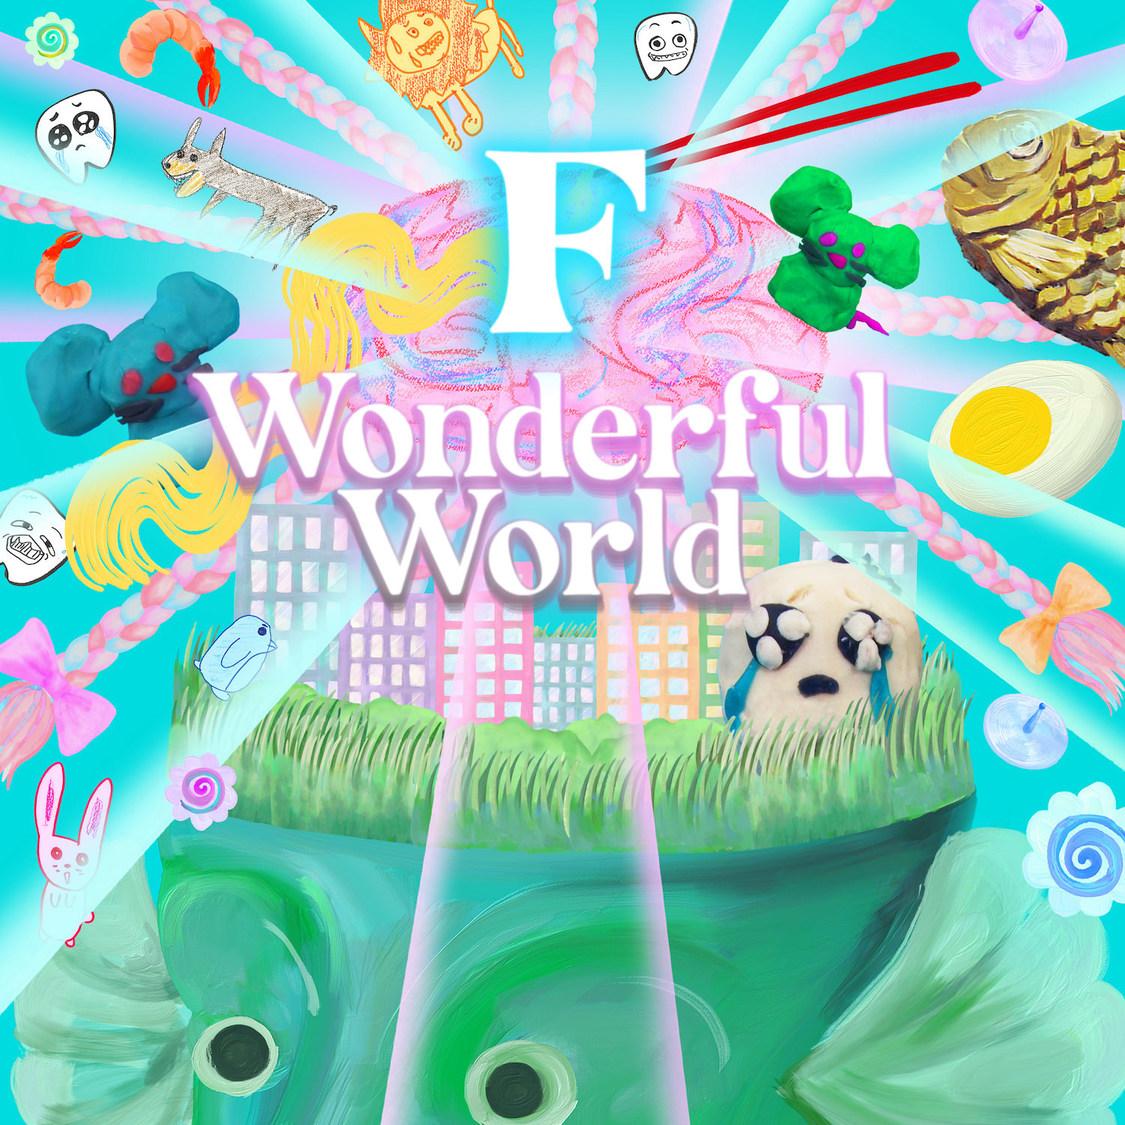 ano、テレ朝『あのちゃんねる』OP「F Wonderful World」配信リリース決定!